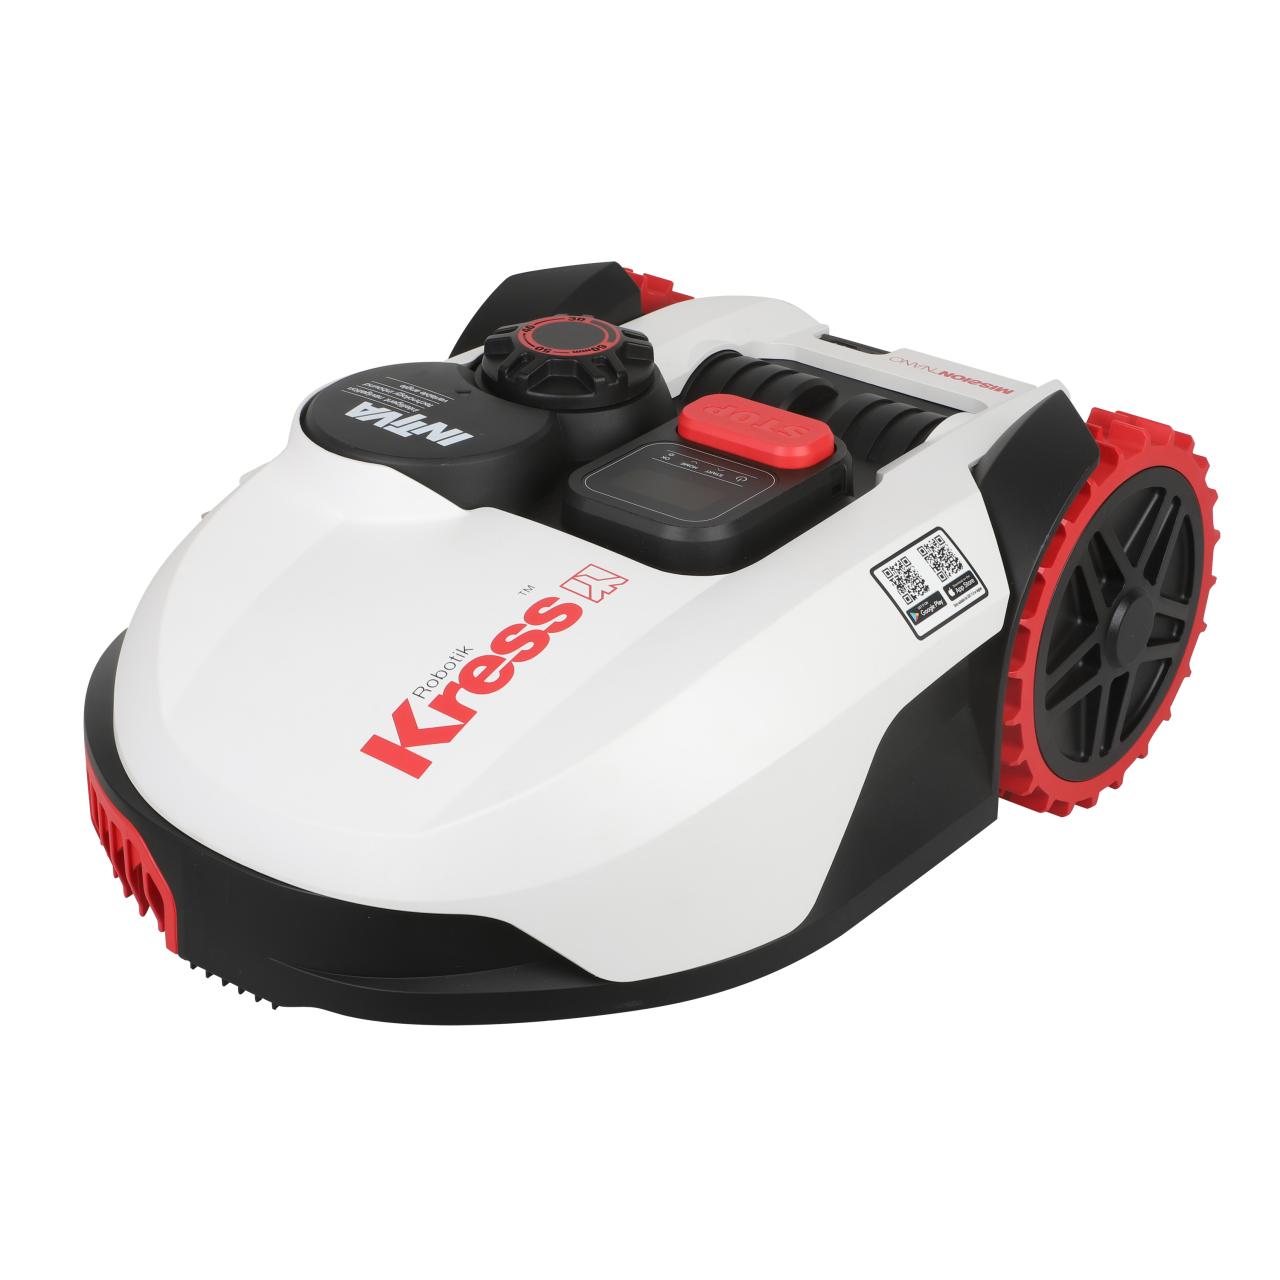 Rasenroboter Nano KR101E